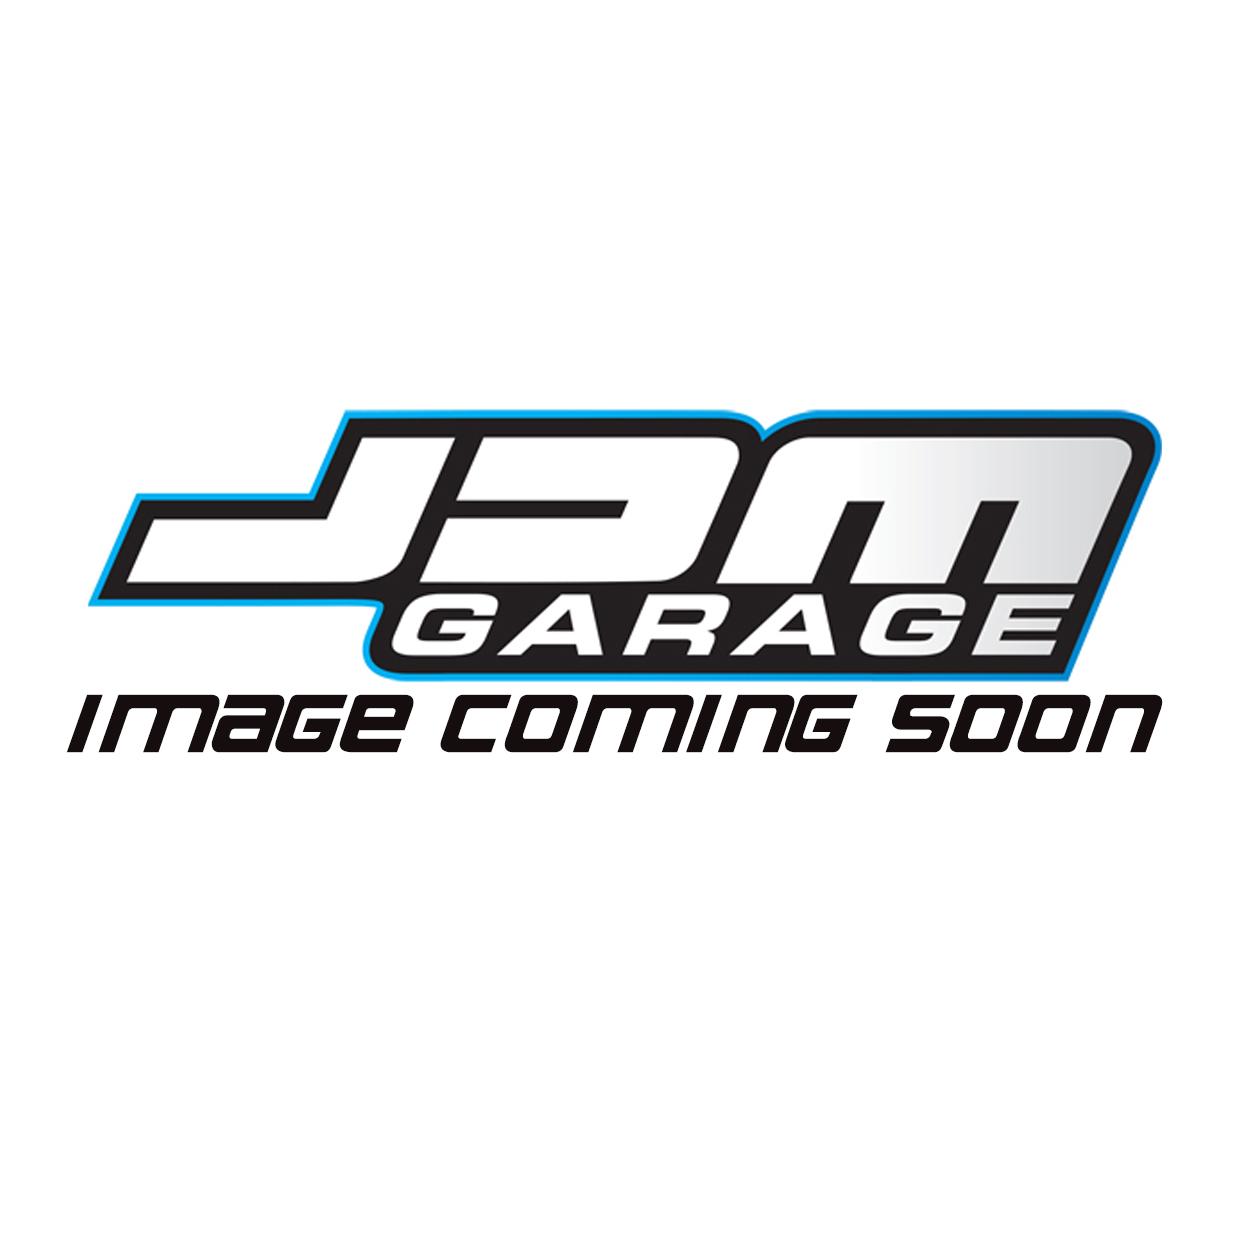 Nissan OEM Block To Transmission Dowel Fits Nissan Skyline / Stagea / Cefiro / Laurel / Silvia / Pulsar RB20 RB25 RB26 CA18 SR20 11022-21000